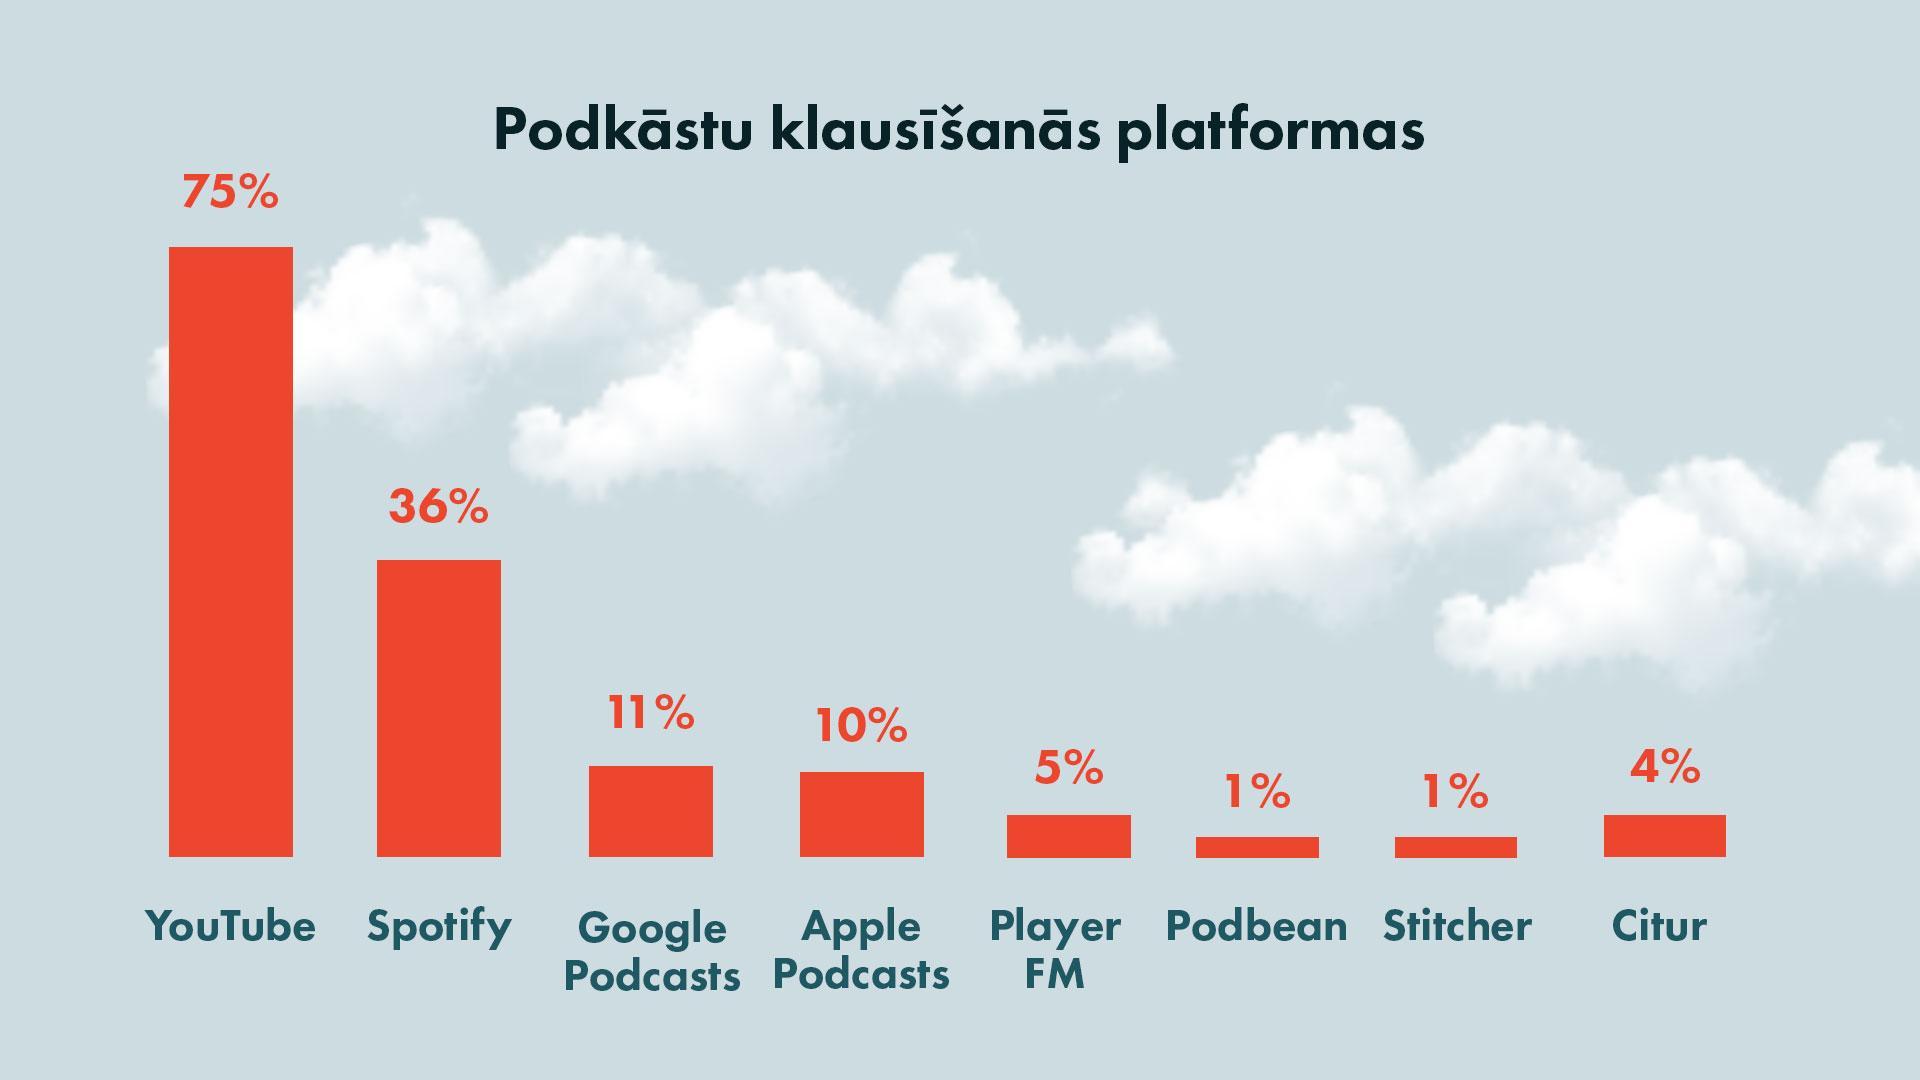 Podcast platforms used